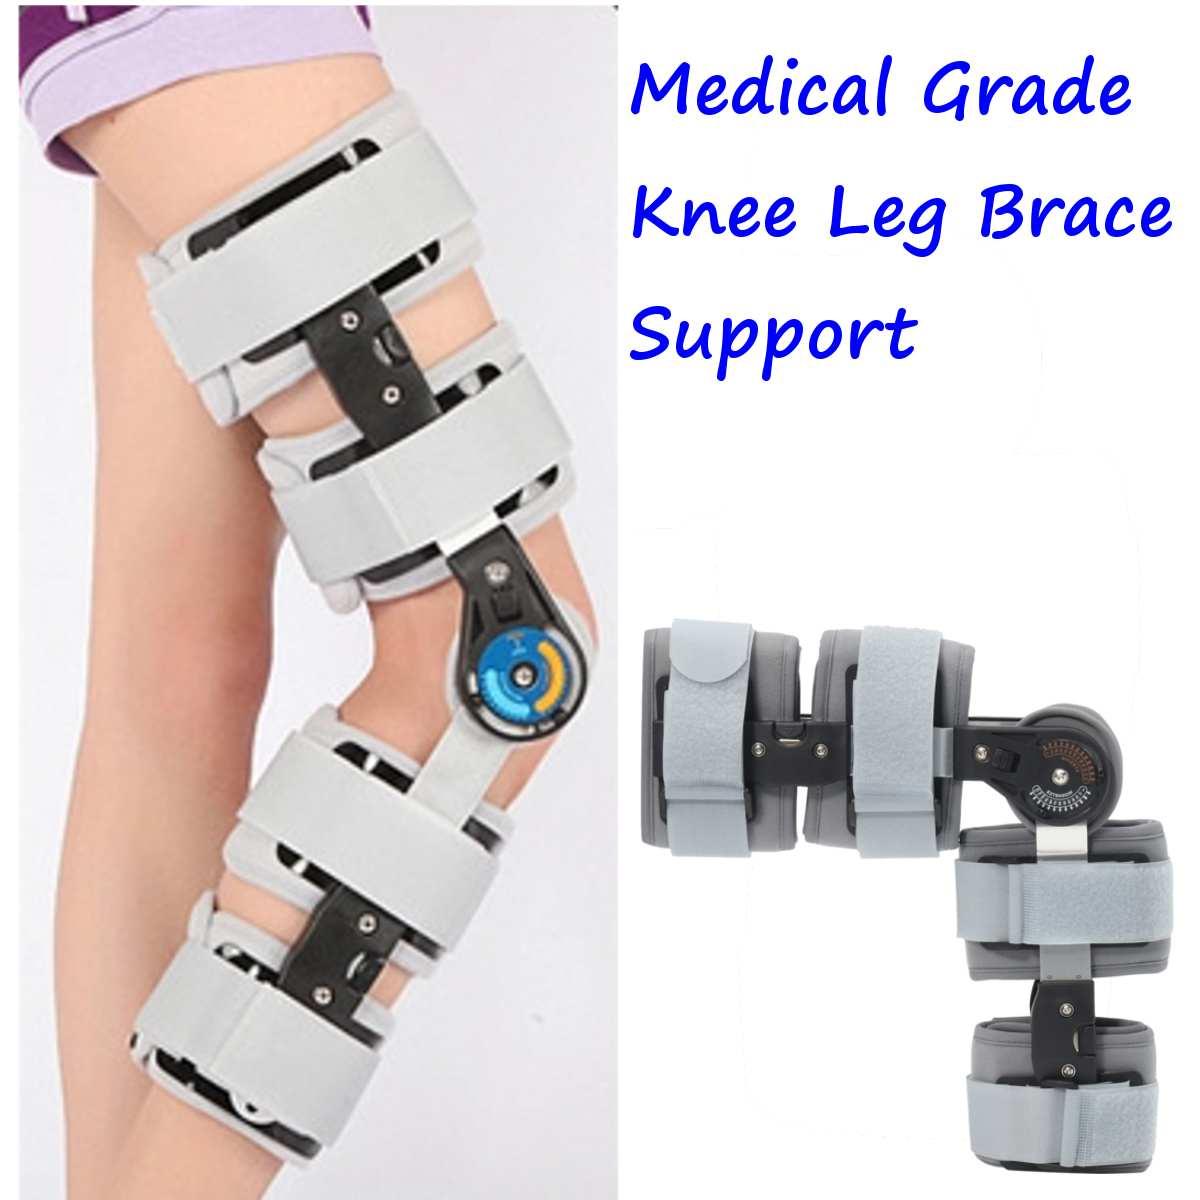 Black/Gray Medical Grade 0-120 Degree Adjustable Hinged Knee Leg Brace Support Protect Knee Ankle Brace Ligament Damage Repair